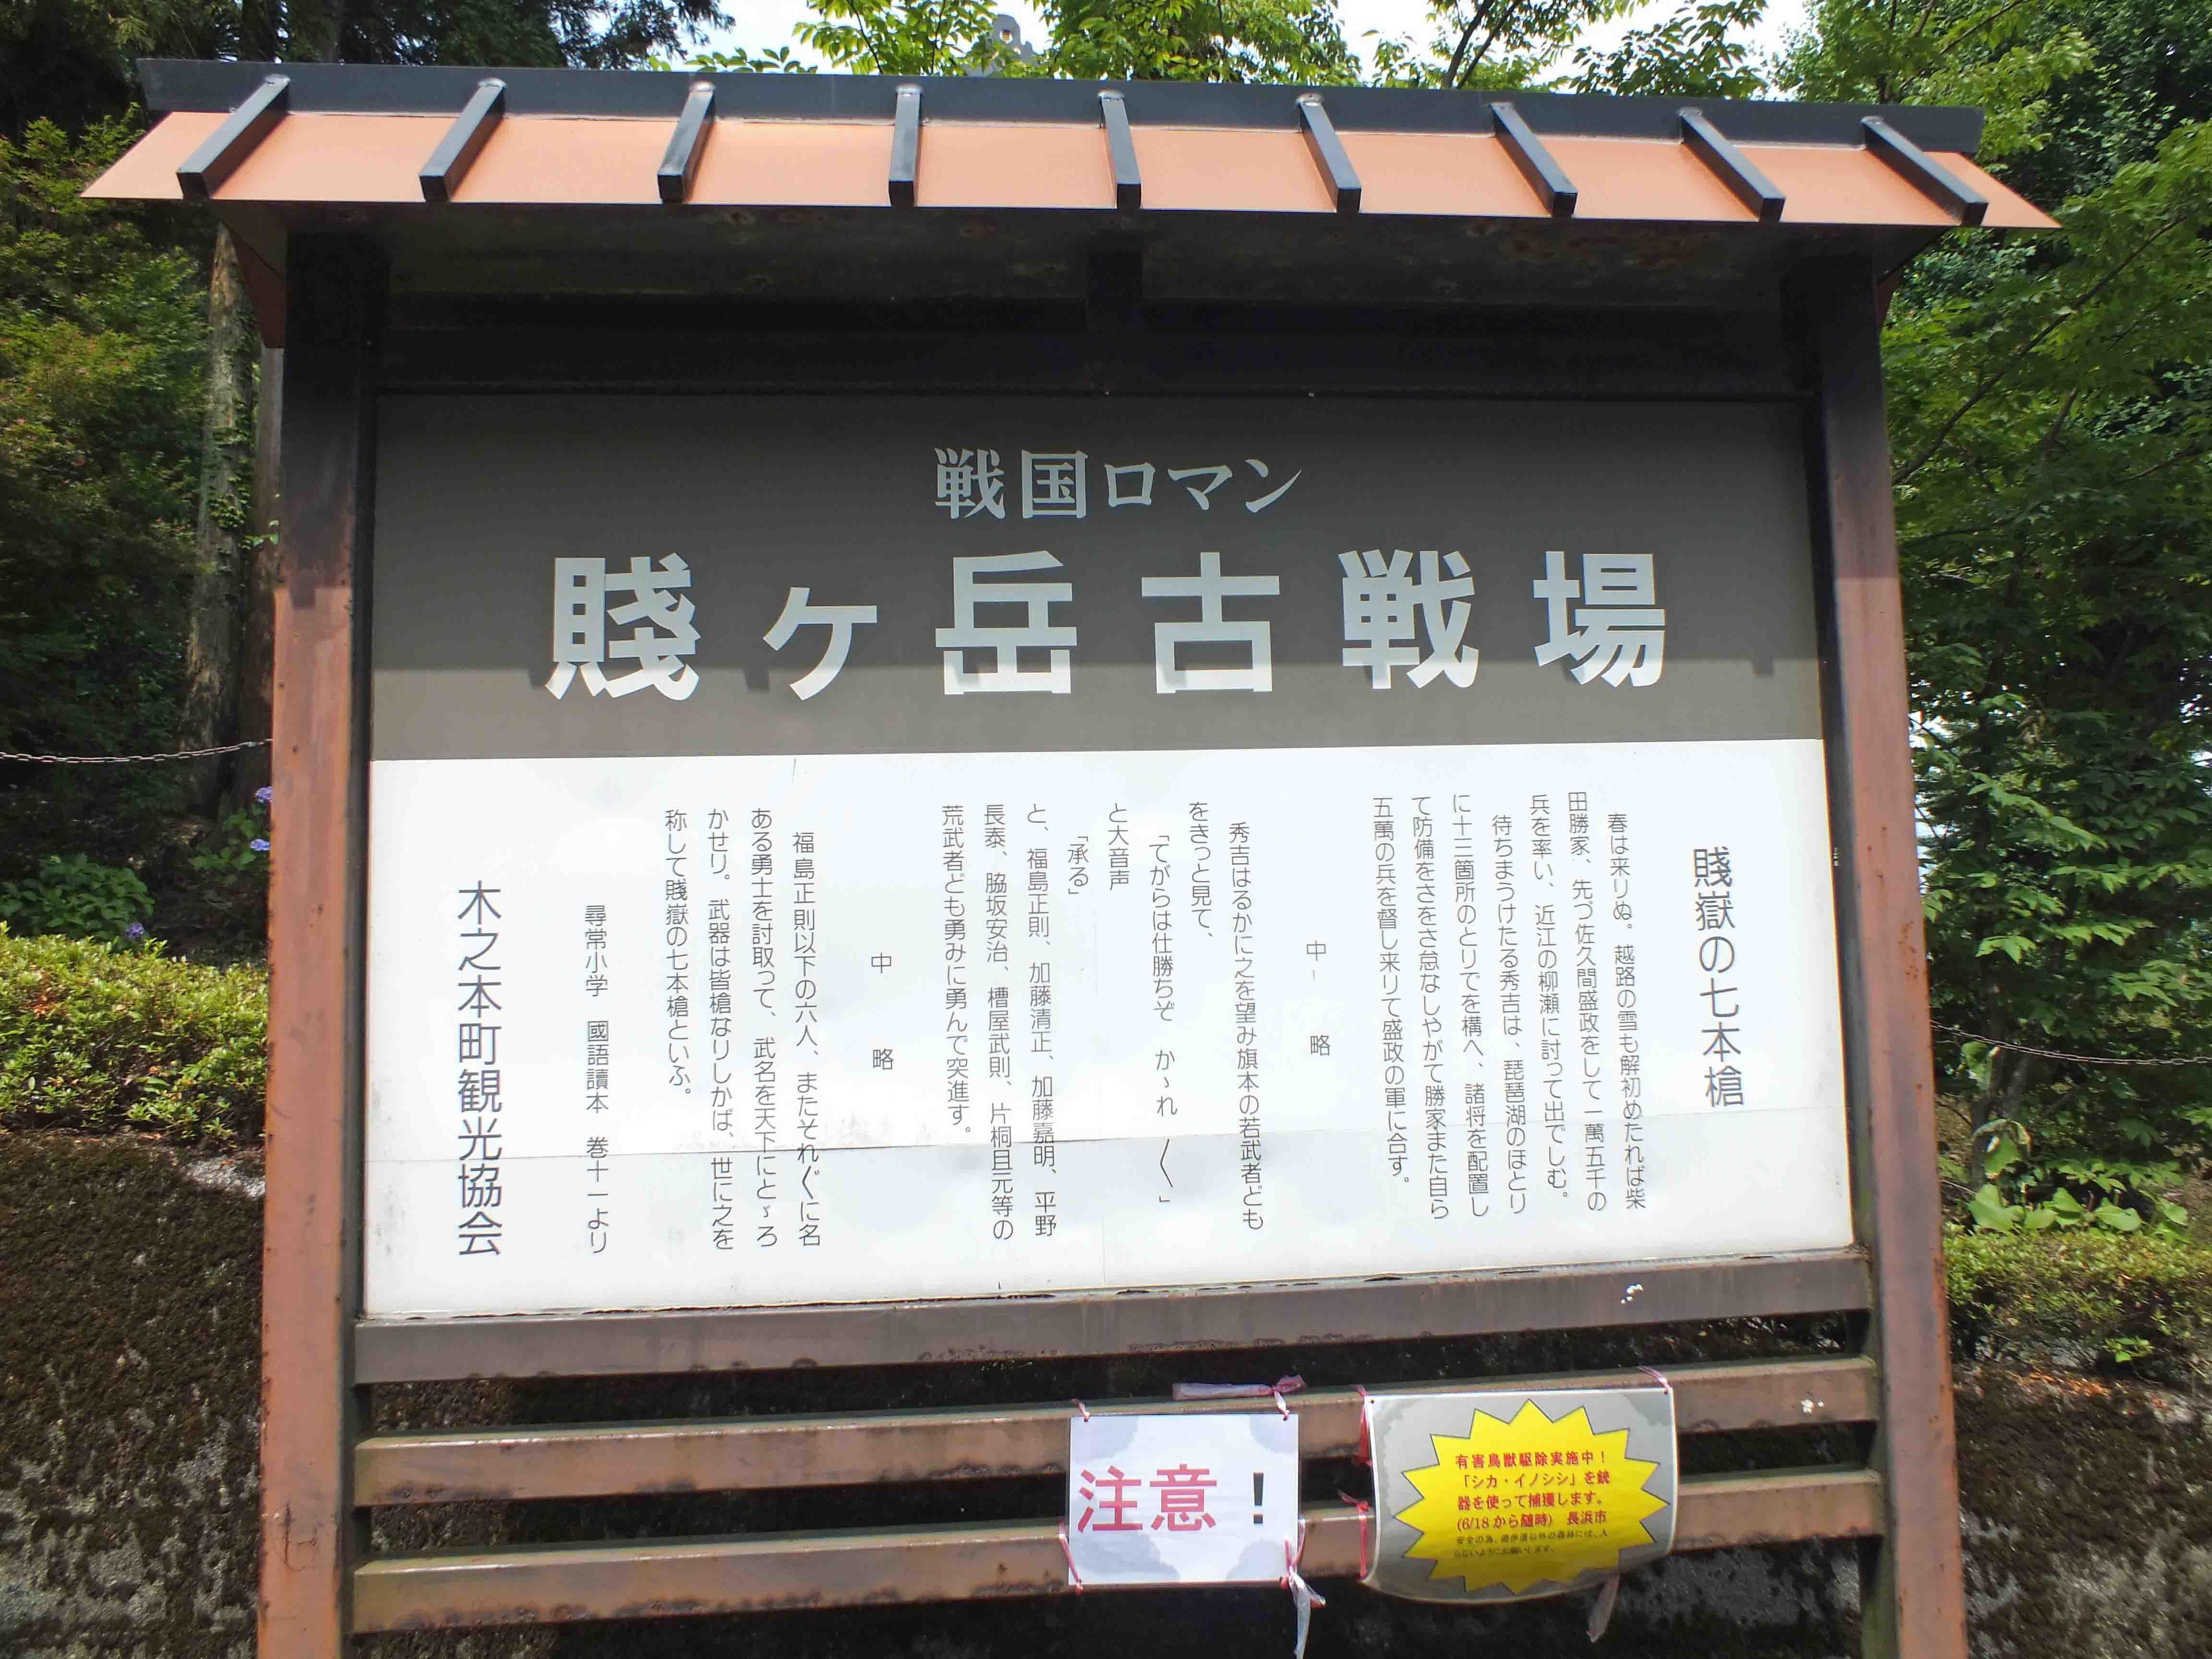 DSCF3180麓の賤ケ岳古戦場説明板